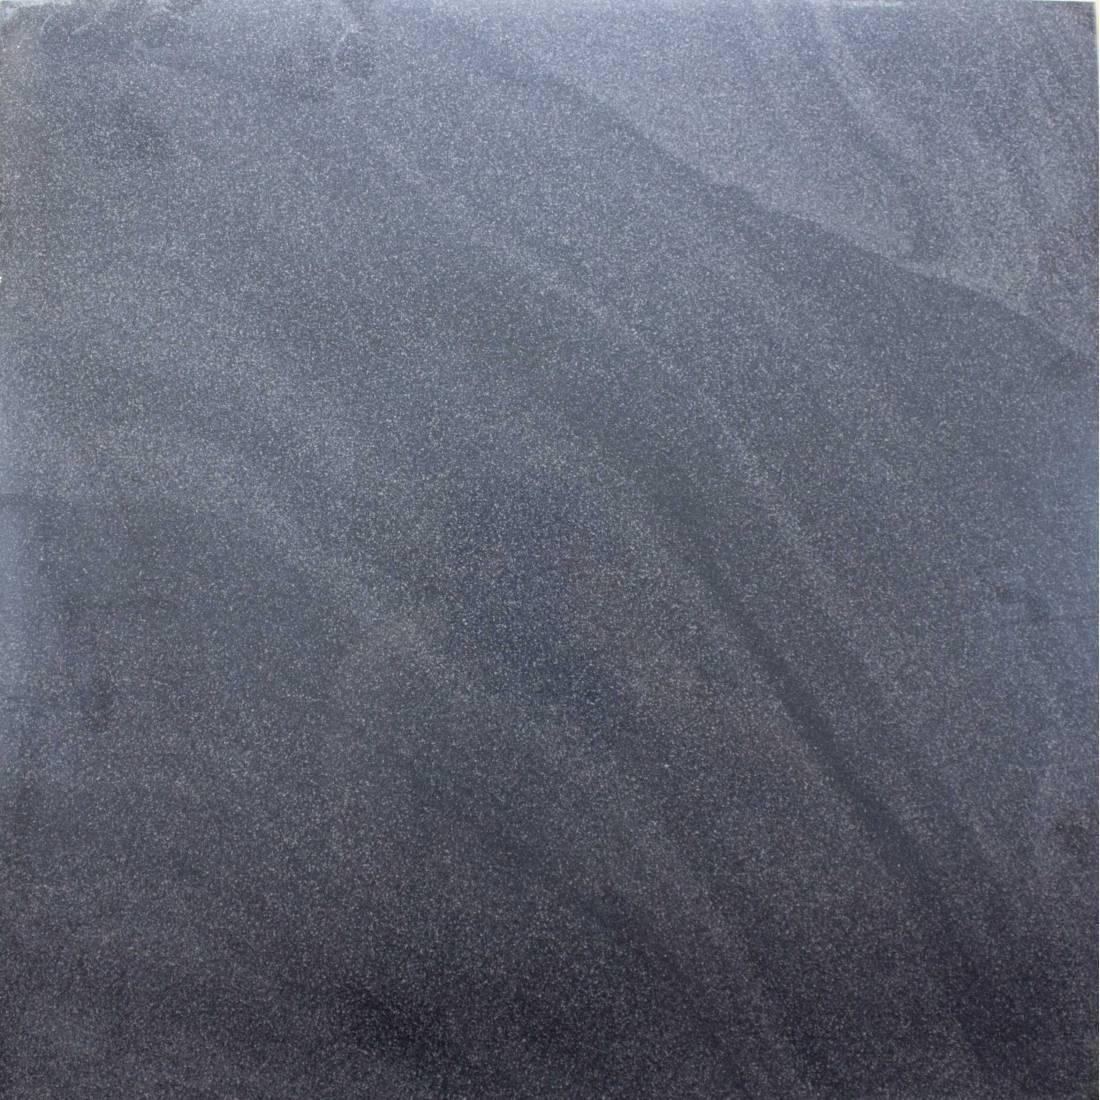 Genesis 60x60 Black Polished 1